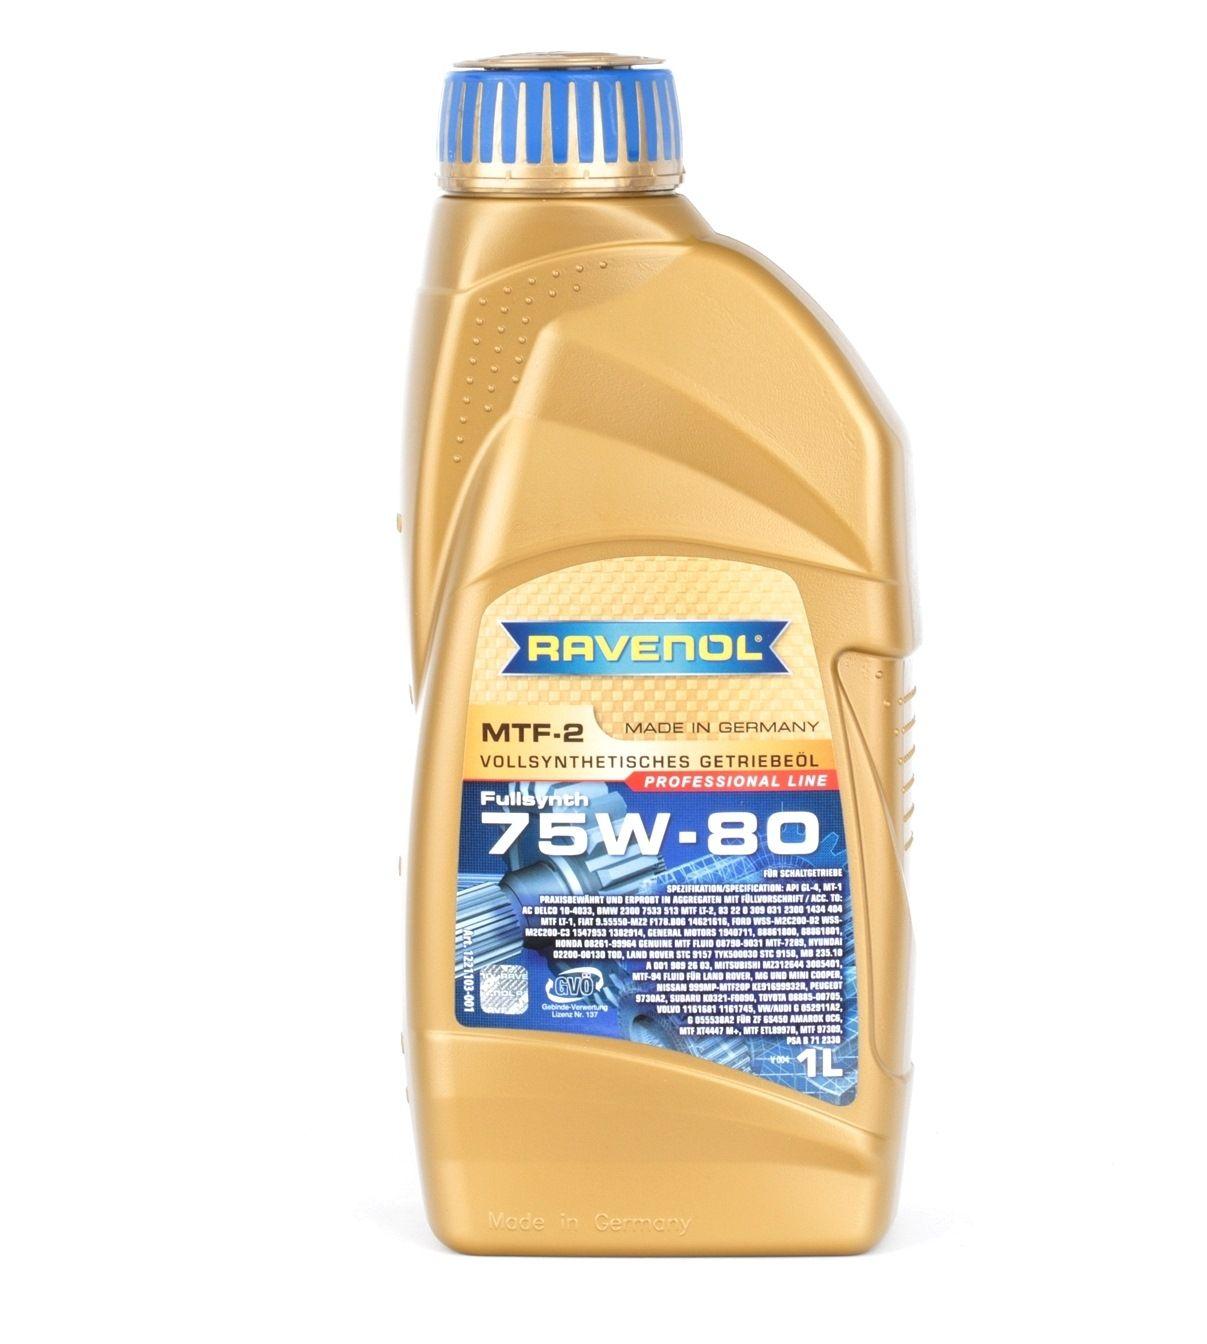 Getriebeöl RAVENOL 1221103-001-01-999 Bewertung